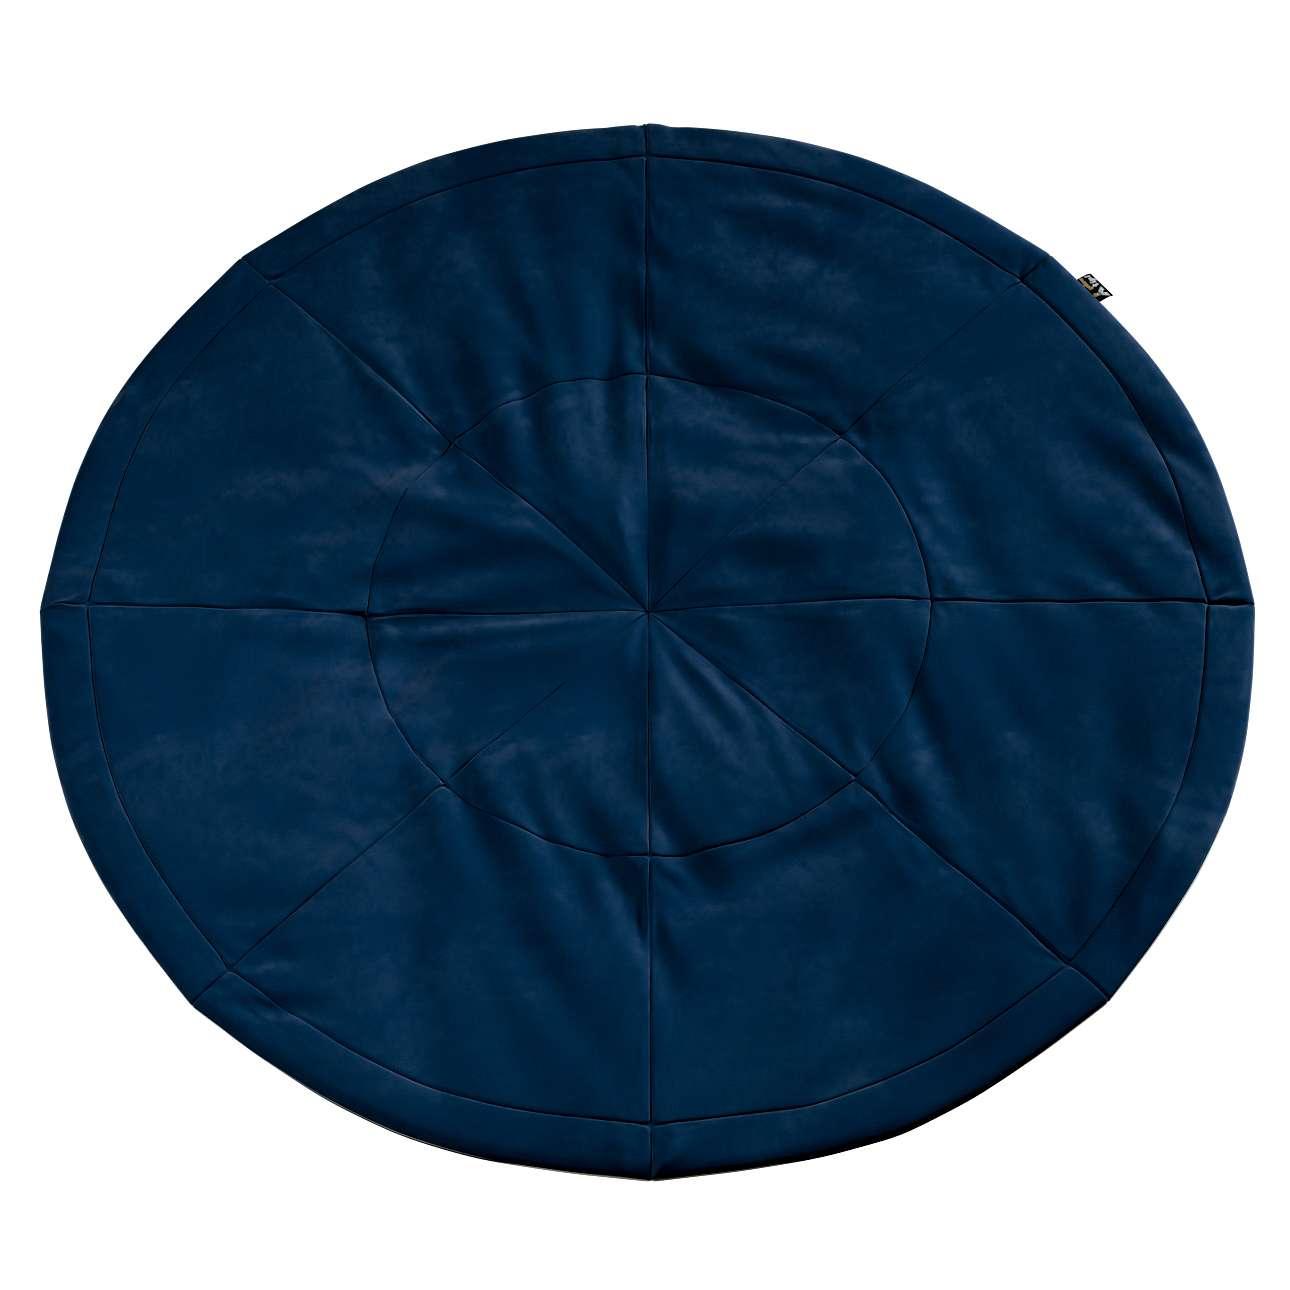 Round mat in collection Posh Velvet, fabric: 704-29